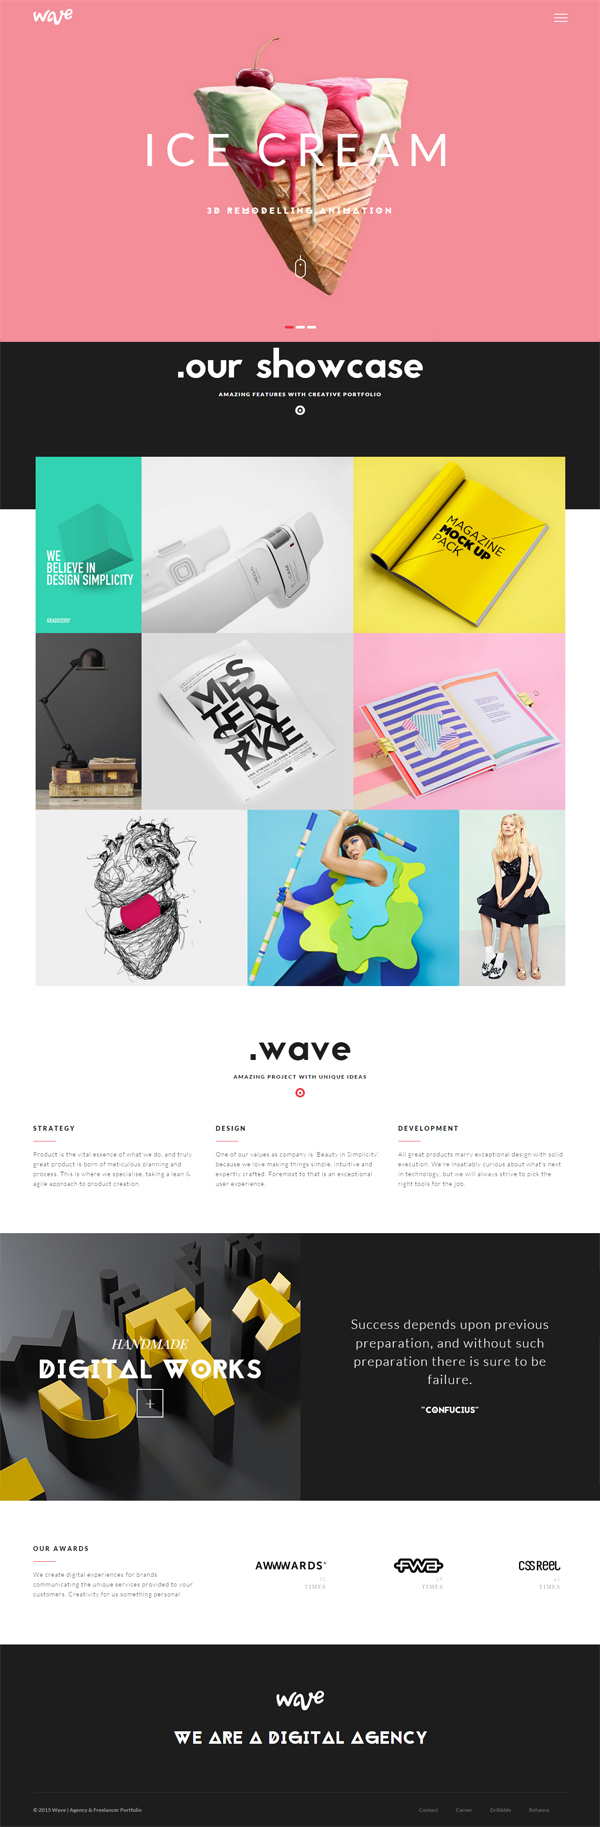 Wave - Agency & Freelancer Portfolio WP Theme